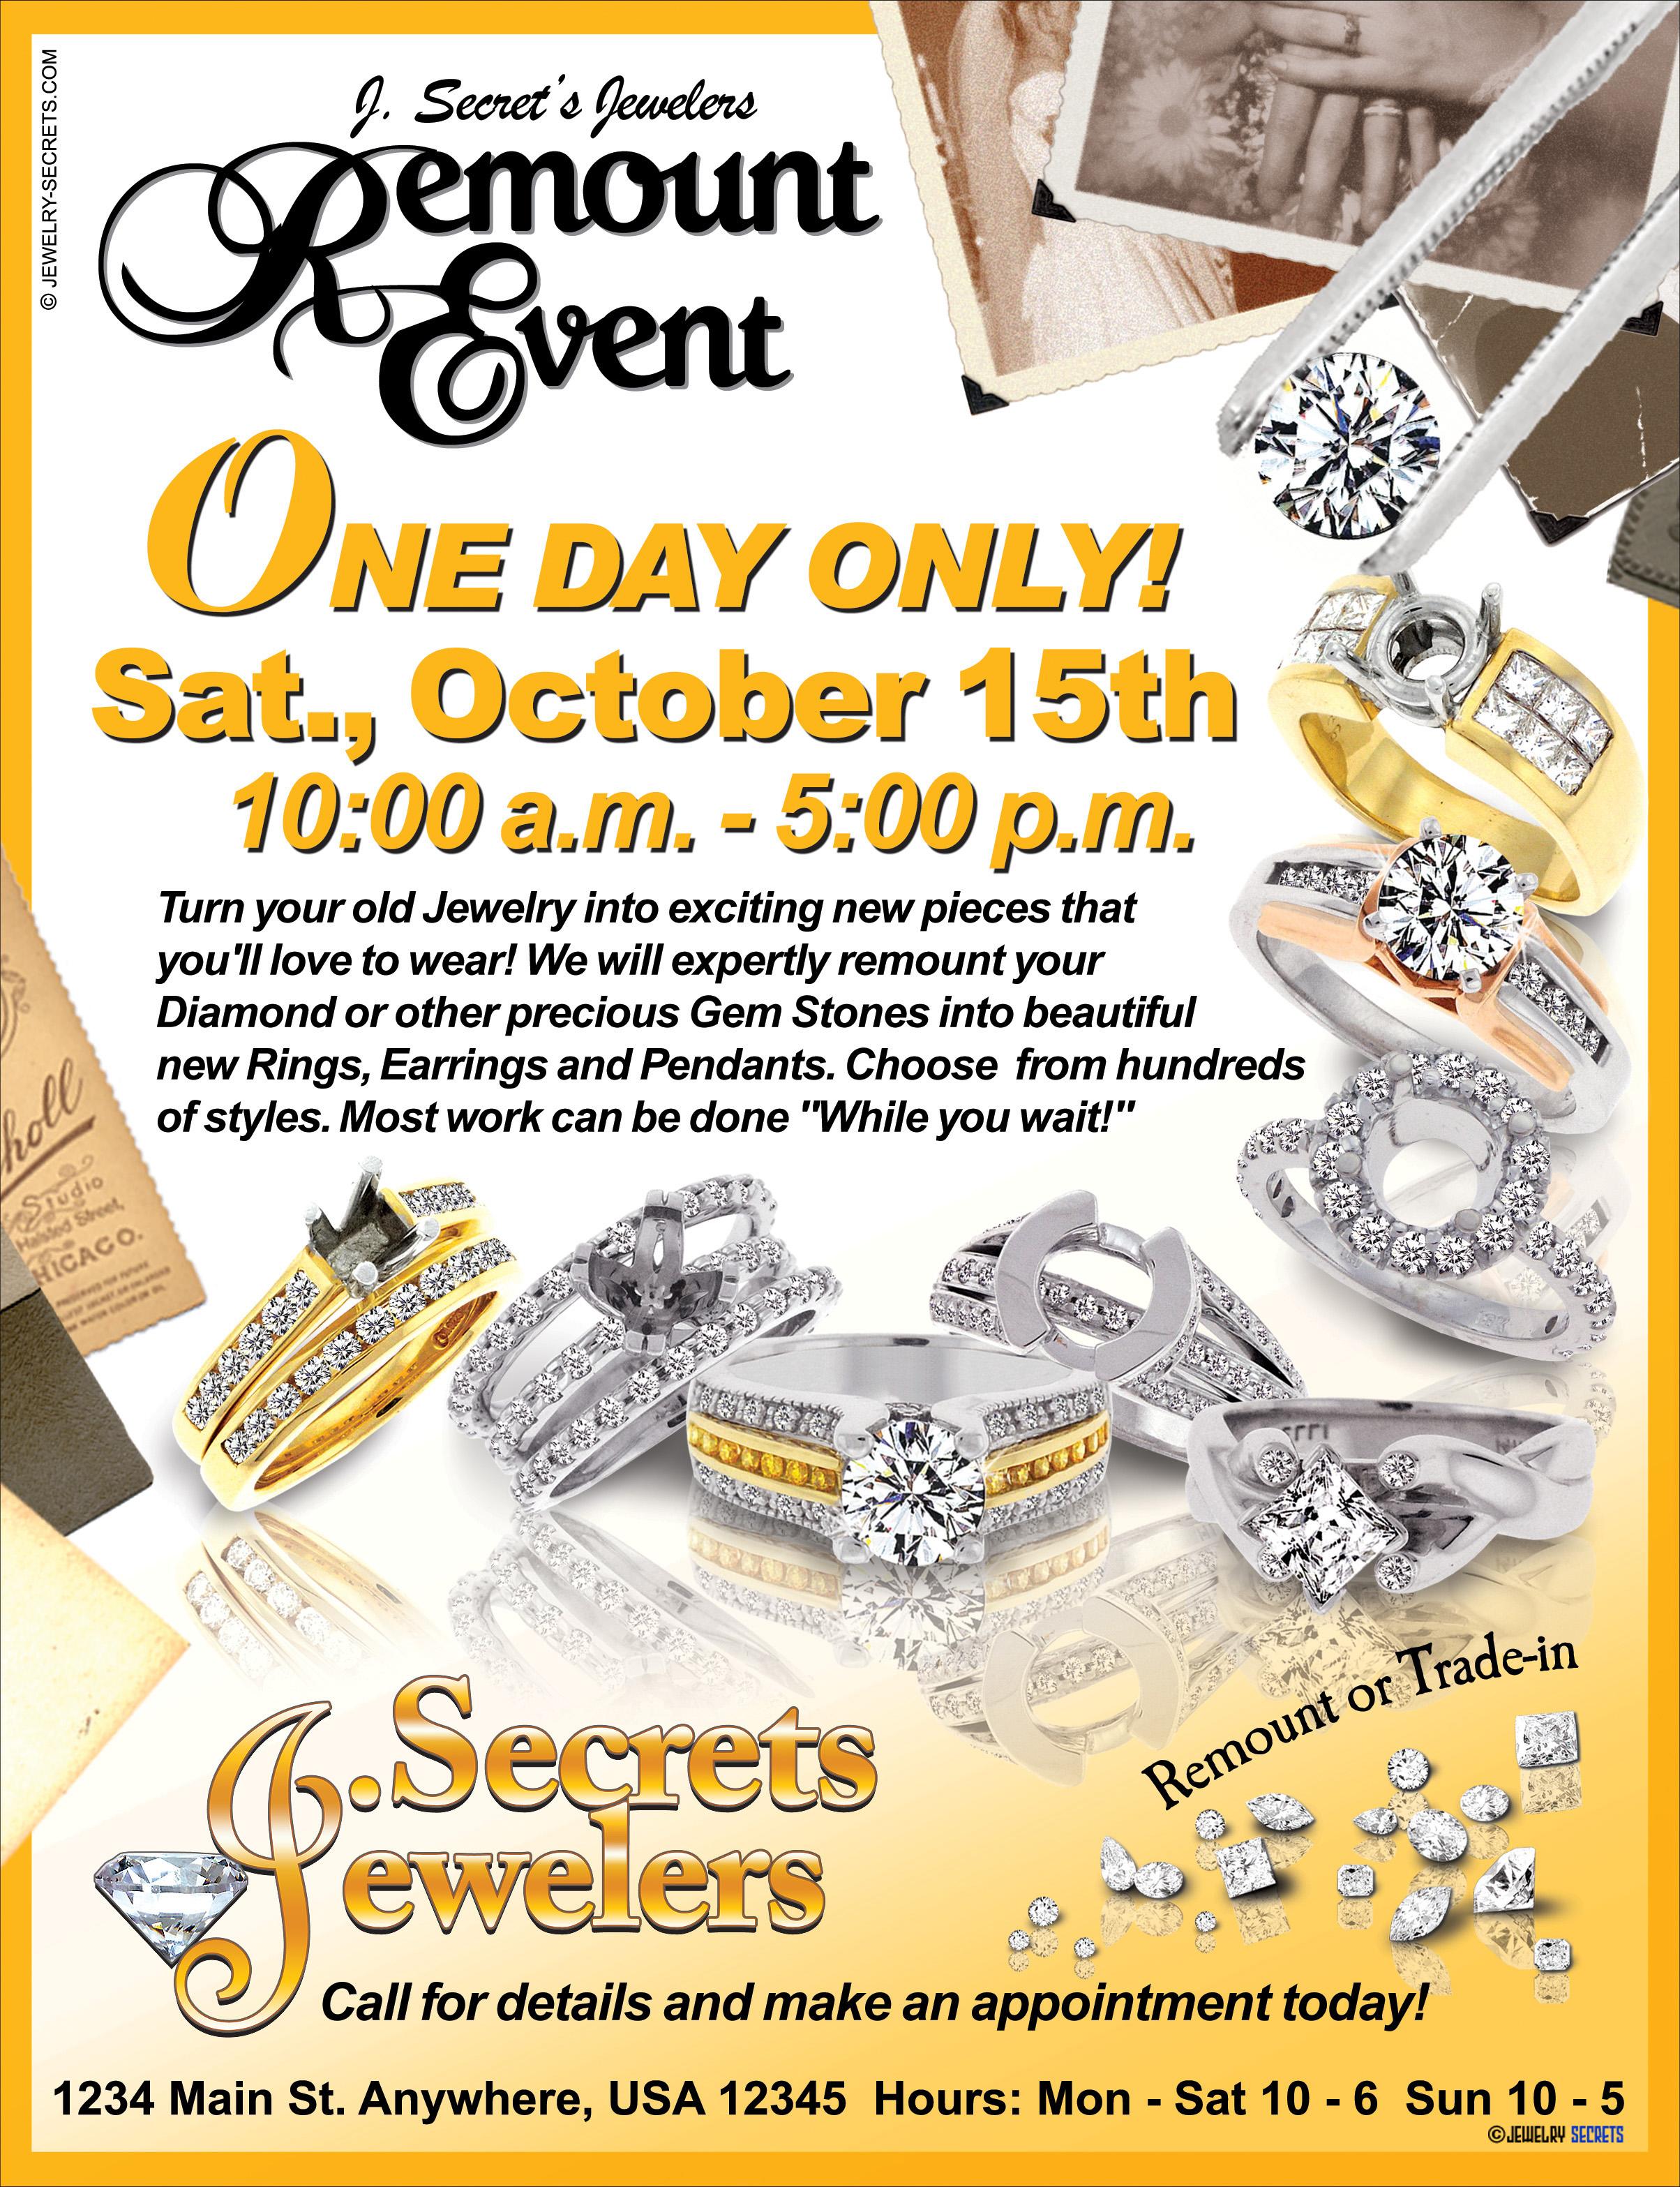 DIAMOND REMOUNT SHOW SAMPLE ADVERTISEMENT – Jewelry Secrets